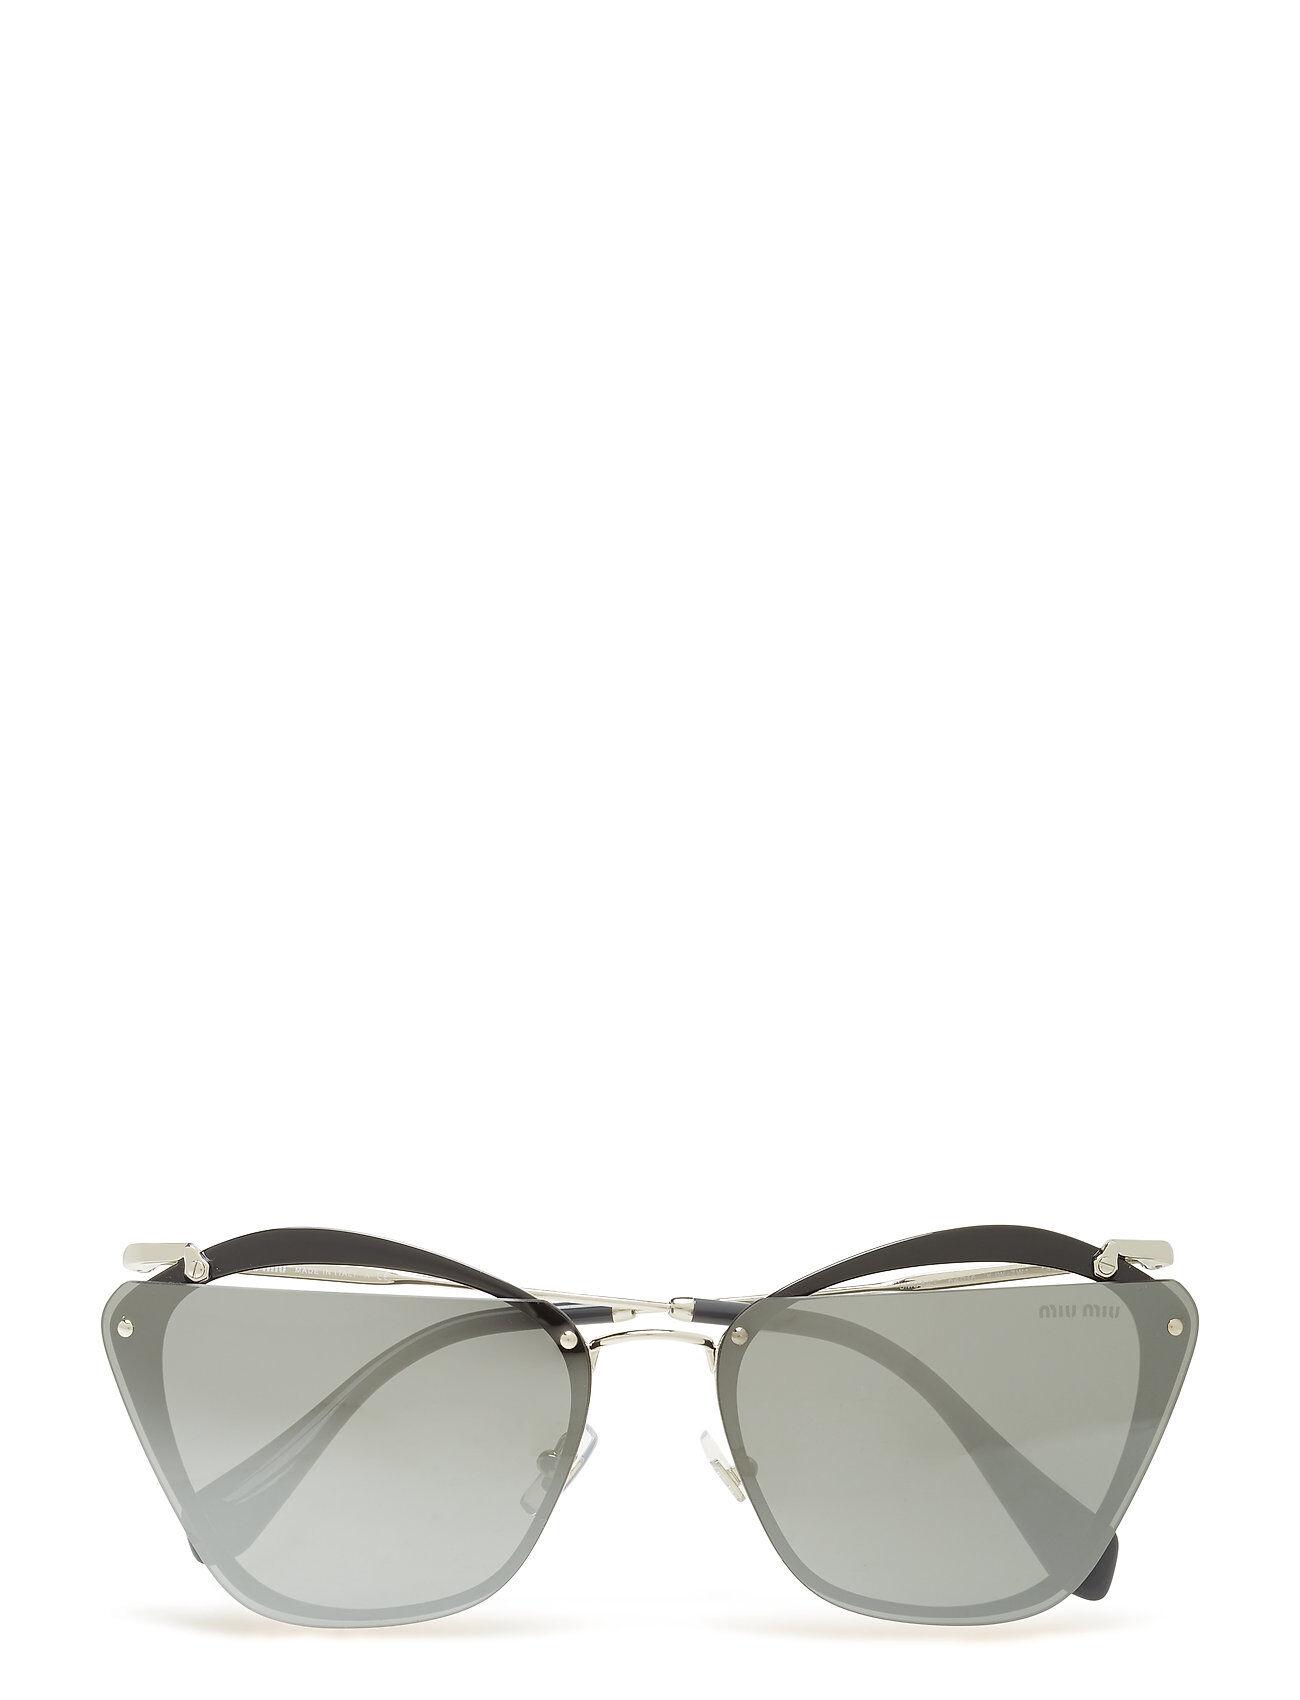 Miu Miu Sunglasses 0mu 54ts